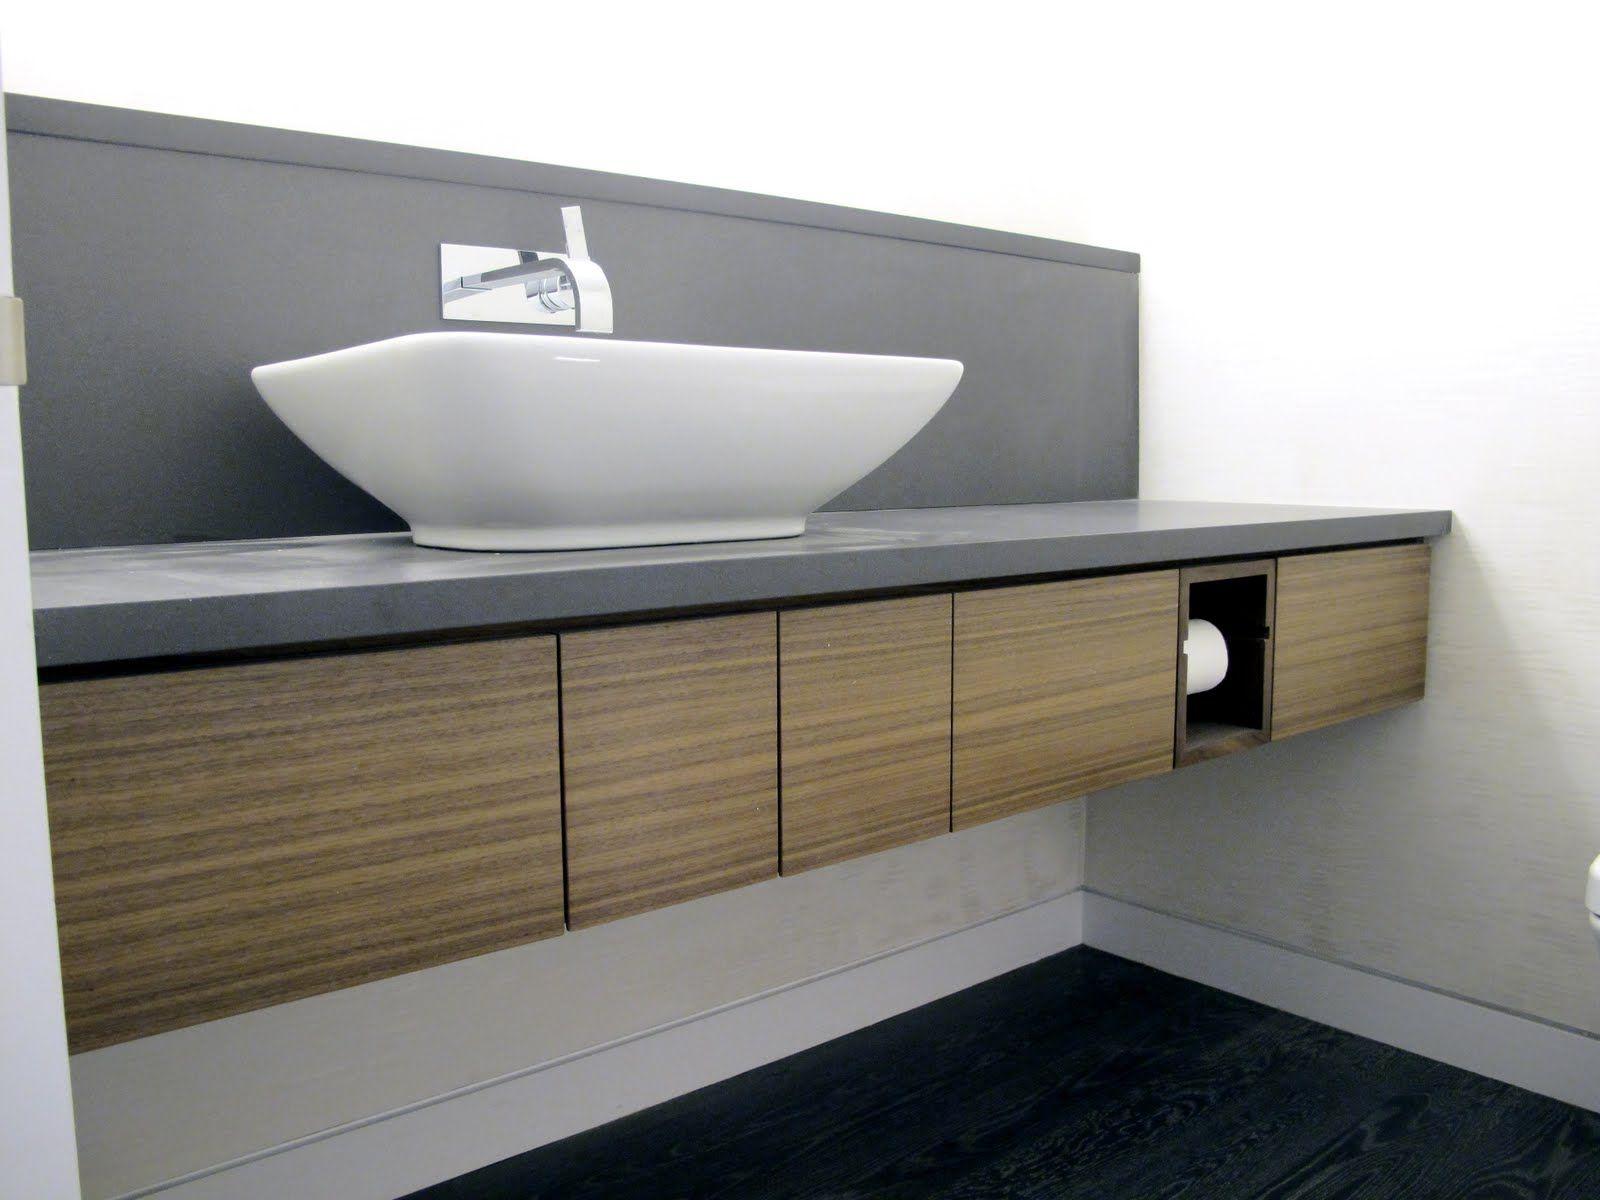 Floating vanity cabinet Google Search bathroom decor Pinterest